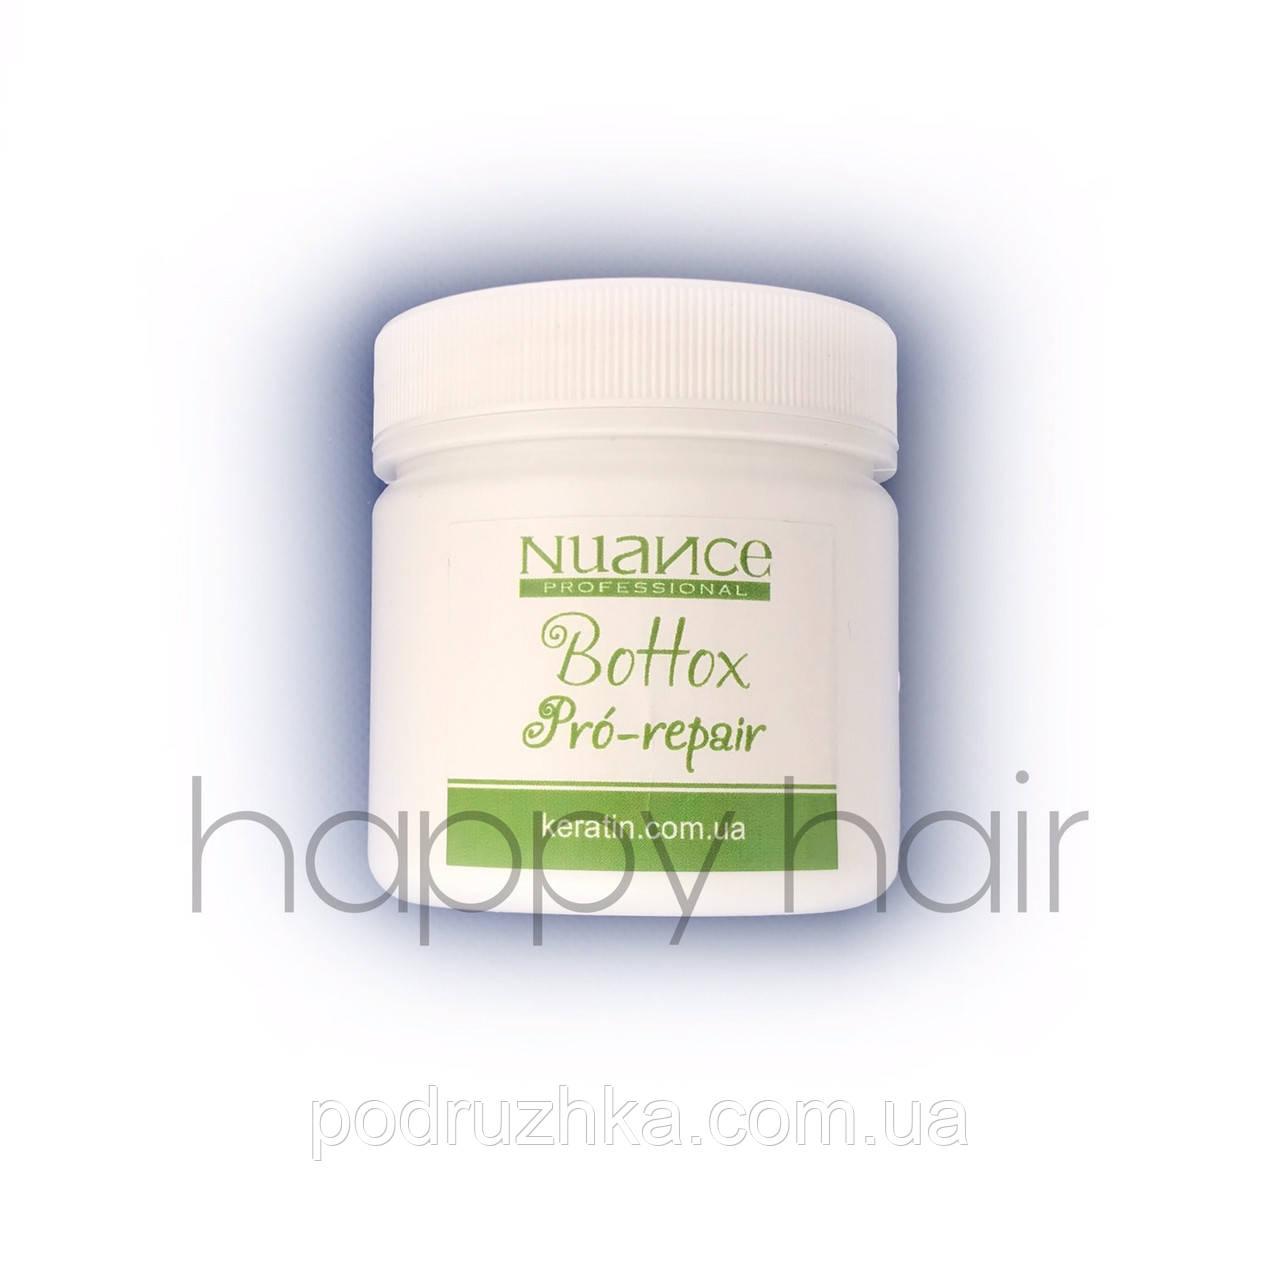 Nuance btox Pro Repair ботекс для волос 100 г